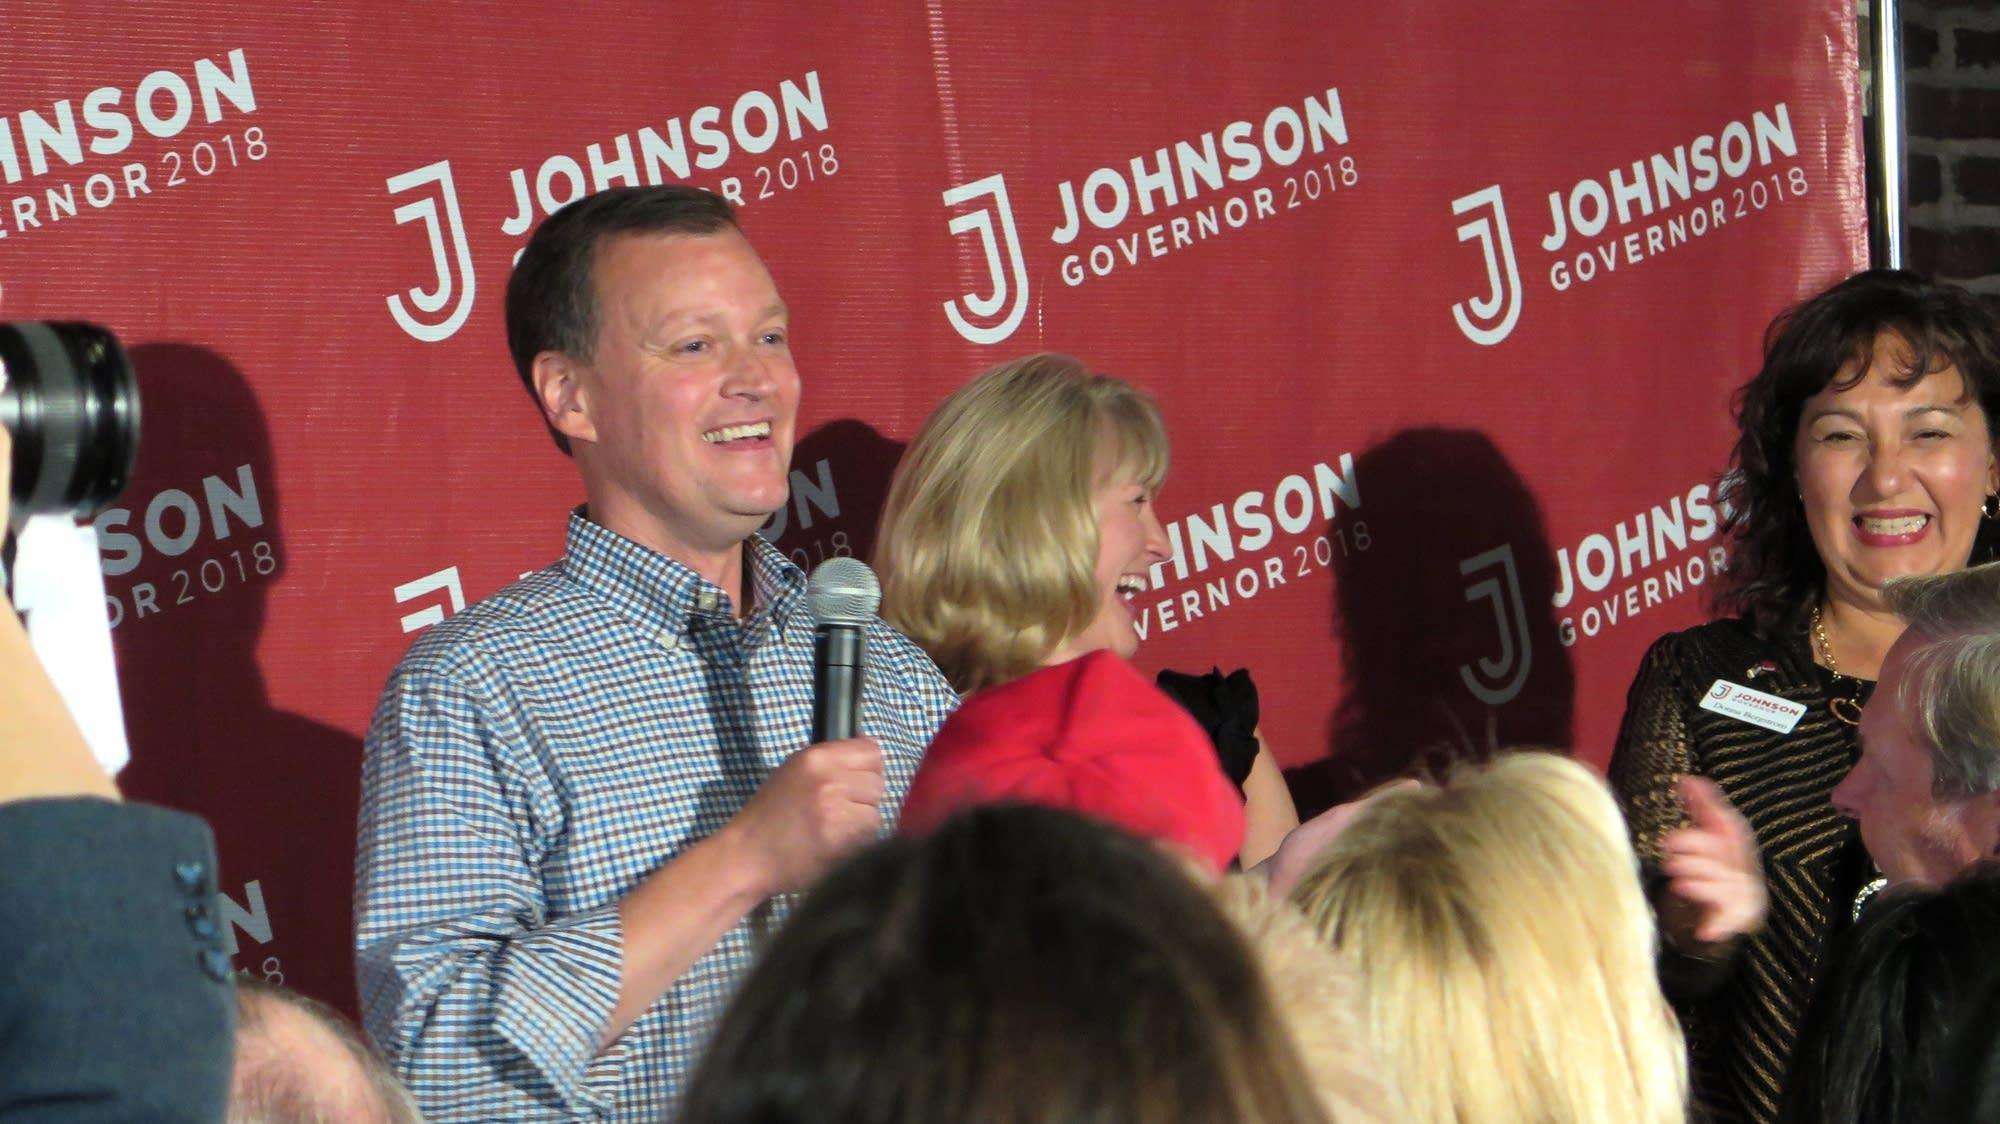 Jeff Johnson celebrates his primary victory over Tim Pawlenty.